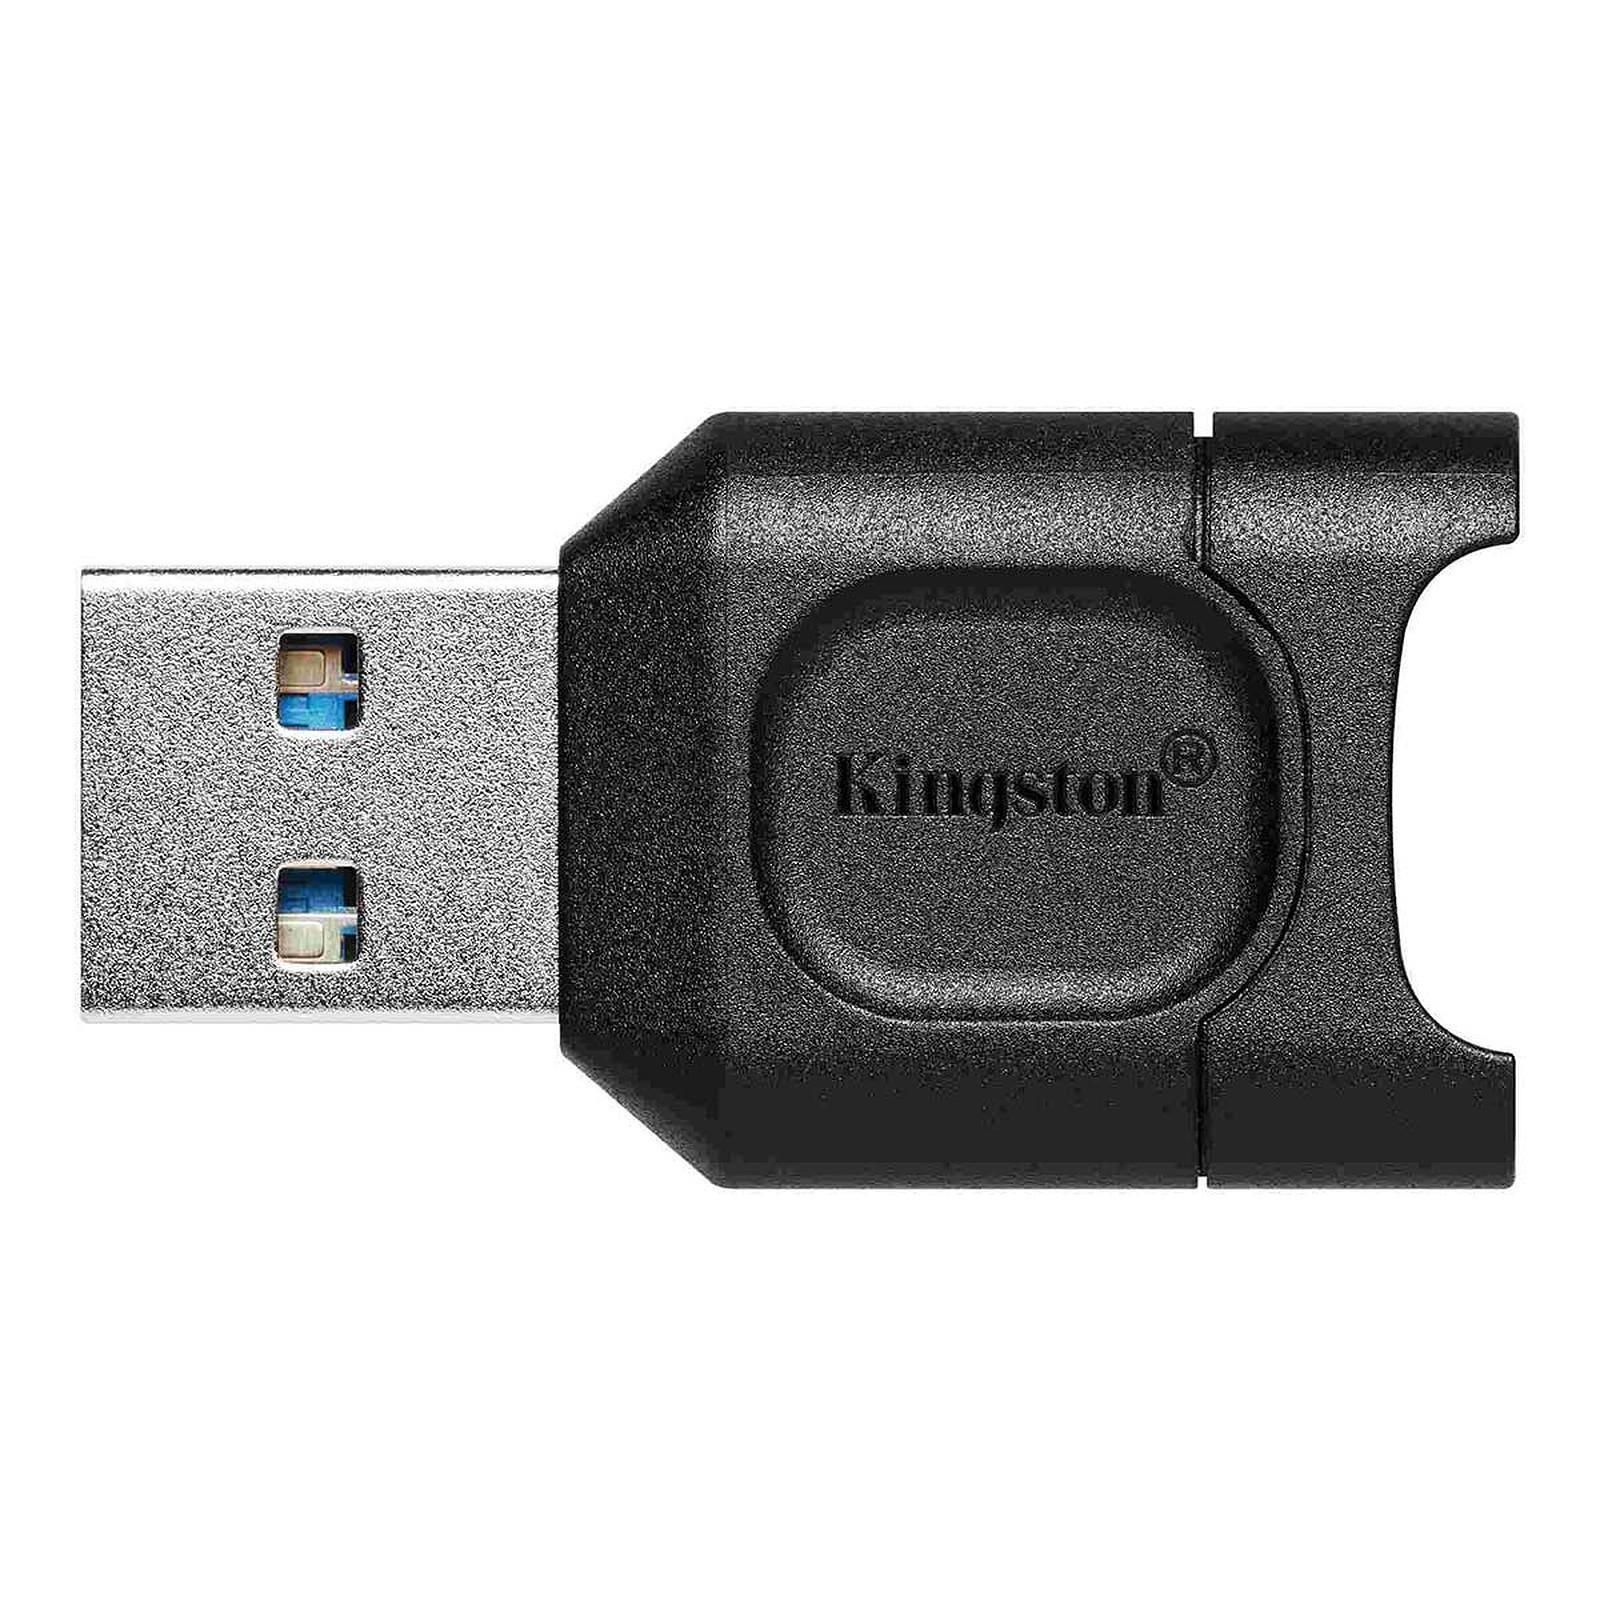 MicroSD MobileLite Plus de Kingston